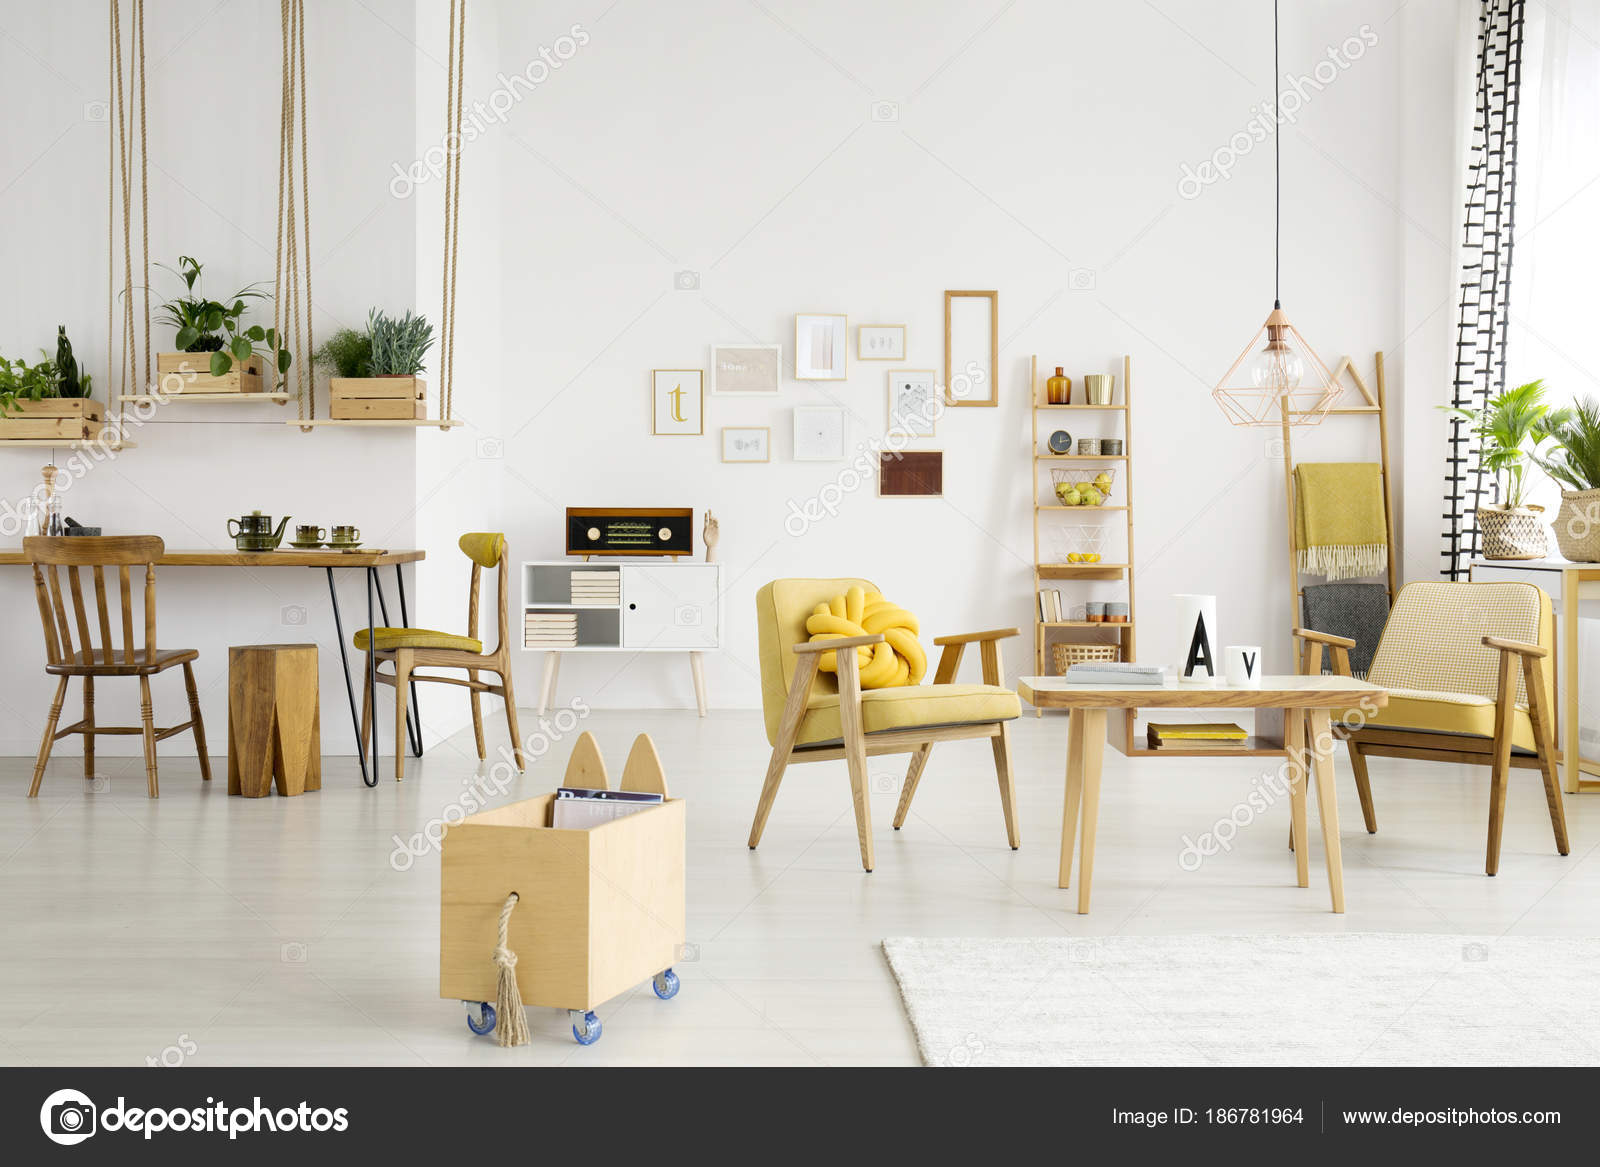 https://st3.depositphotos.com/2249091/18678/i/1600/depositphotos_186781964-stock-photo-dining-room-with-relax-area.jpg